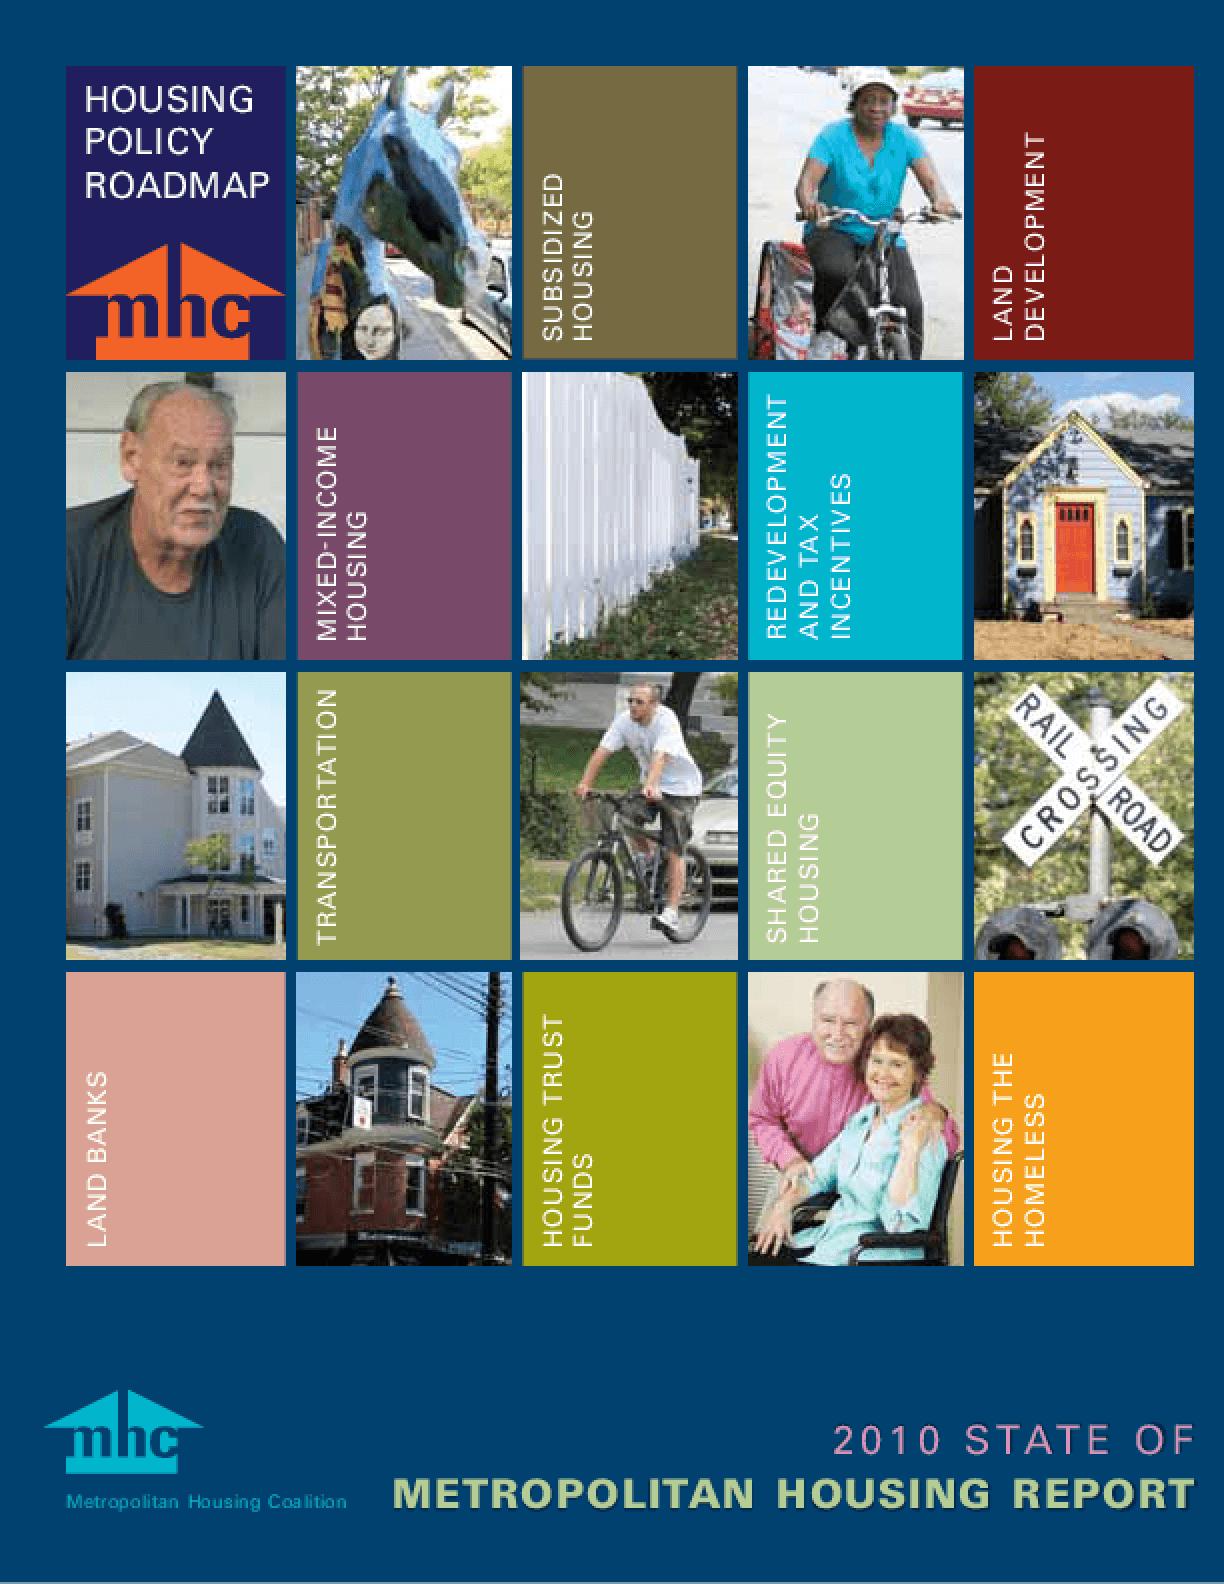 2010 State of Metropolitan Housing Report